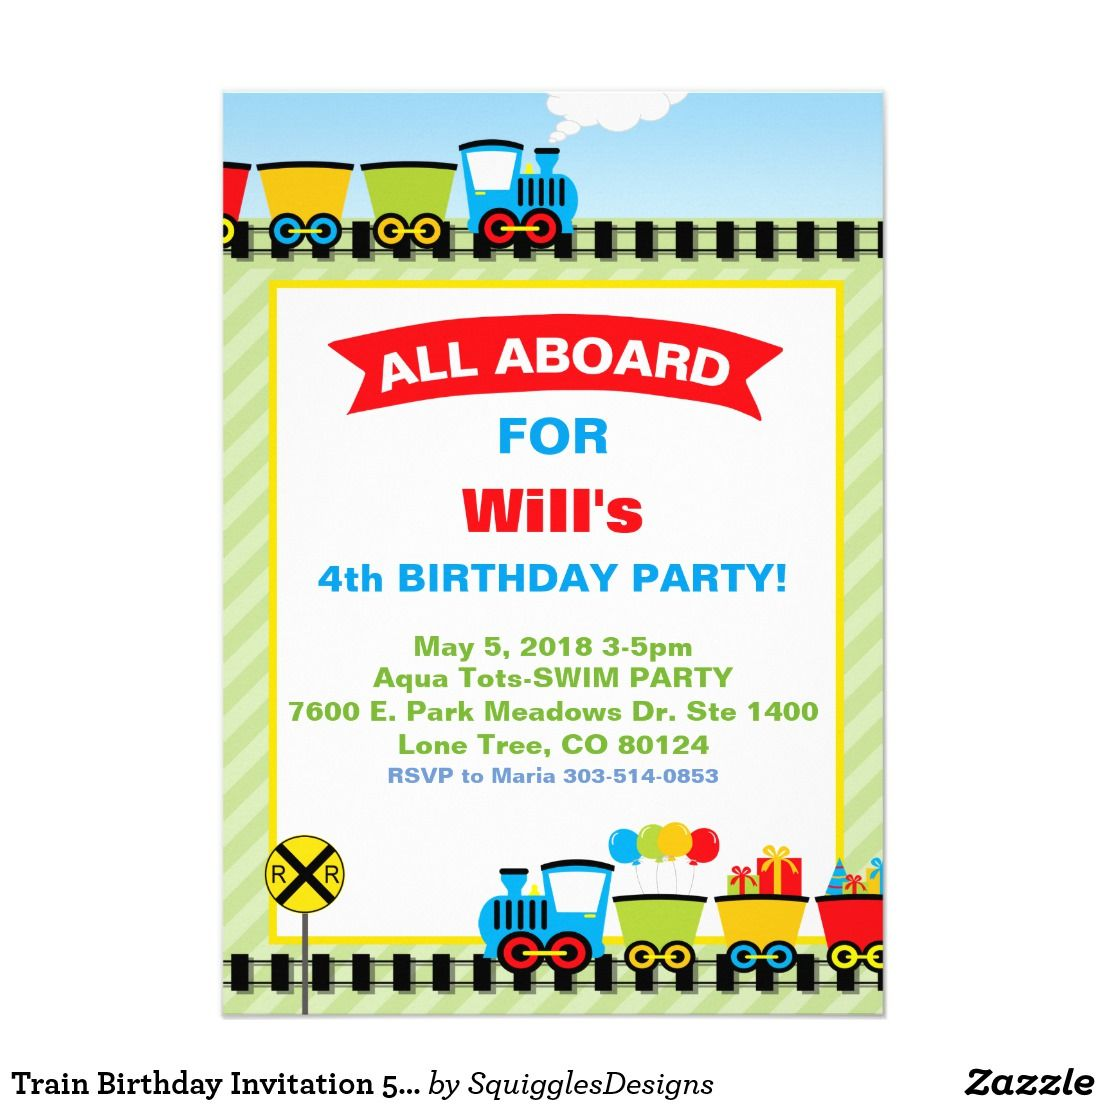 Train Birthday Invitation 5x7 Photo Card | Will | Pinterest | Photo ...